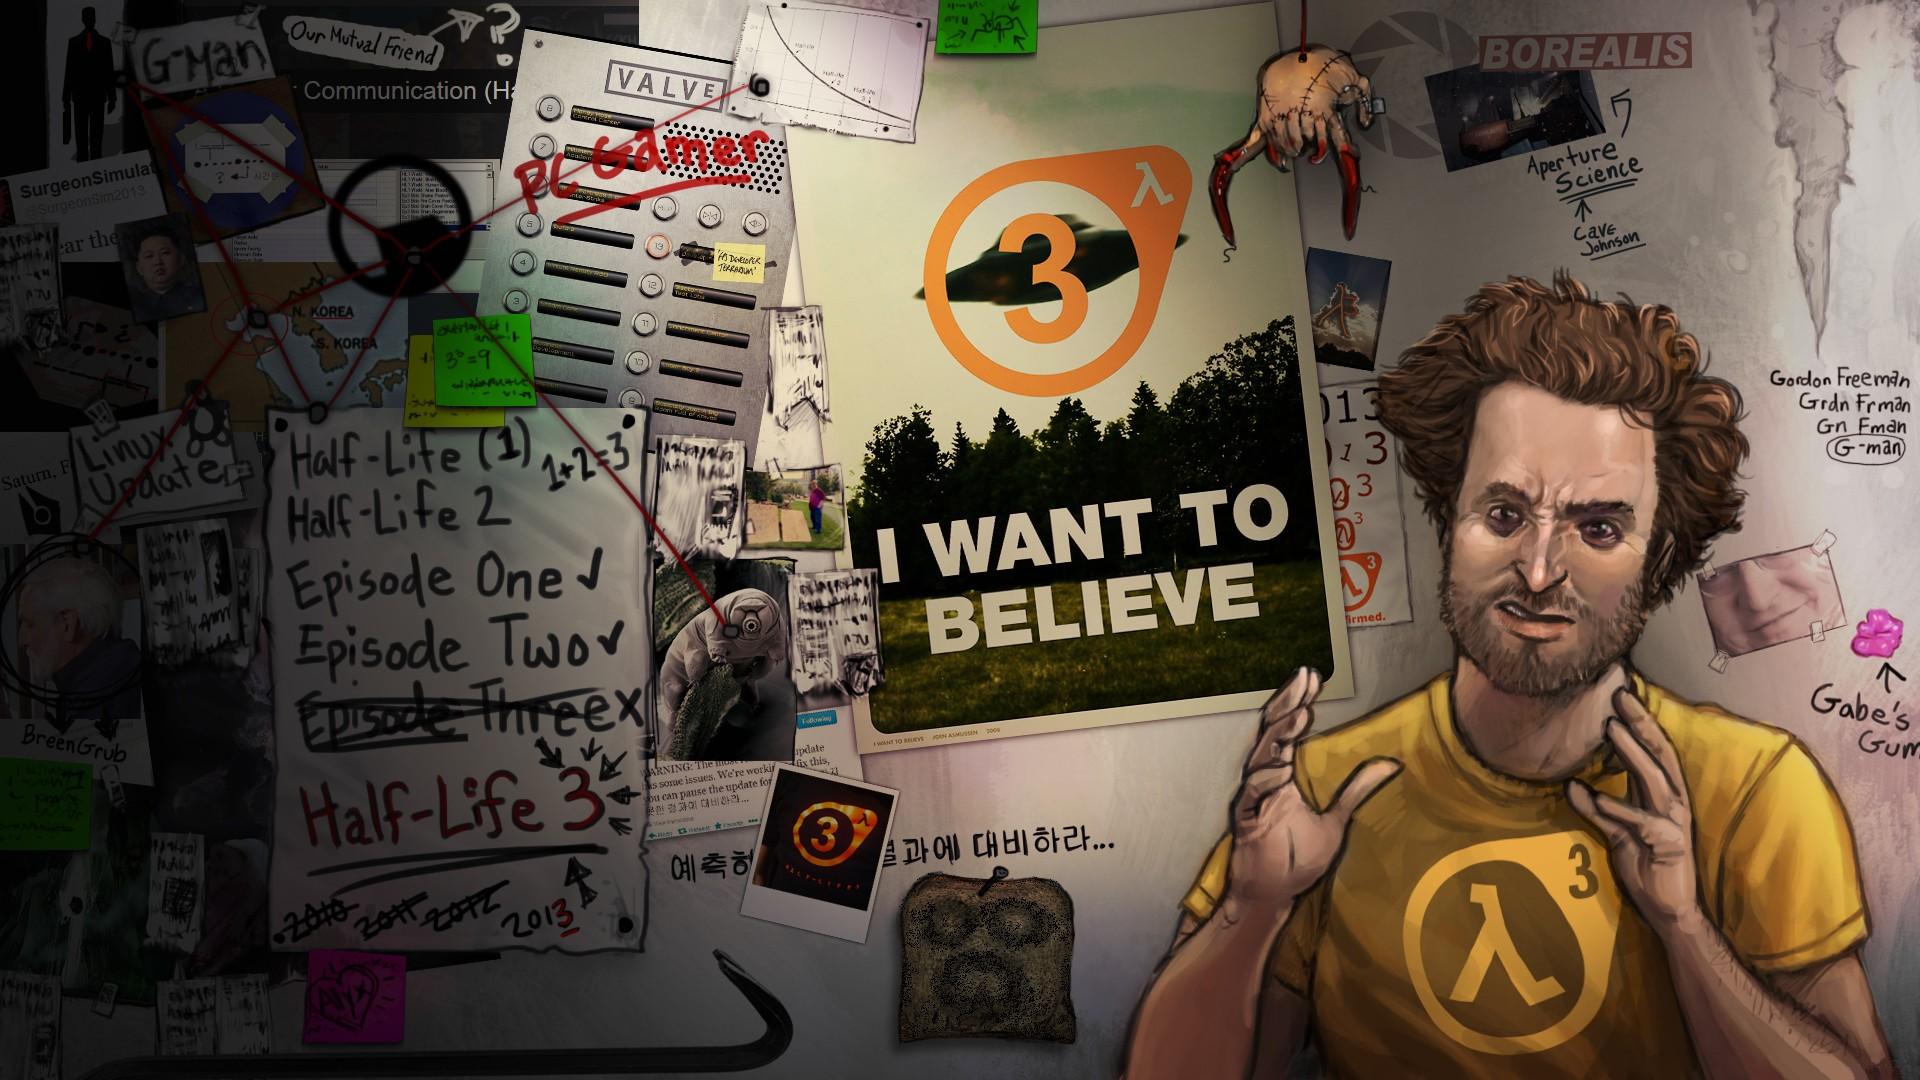 HD Wallpaper   Background ID:418312. 1920x1080 Video Game Half-life 3